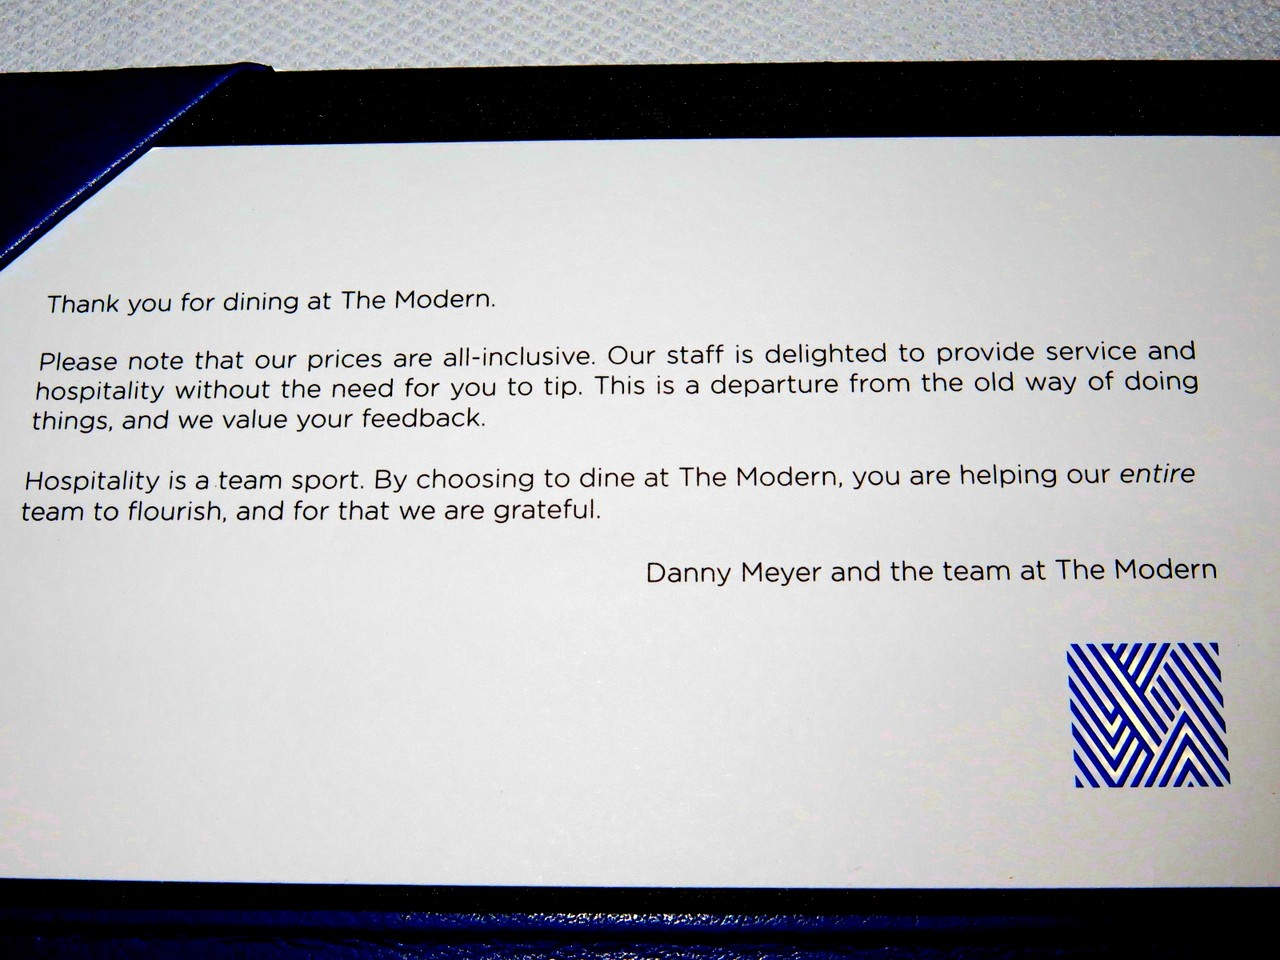 Mensagem de Danny Meyer